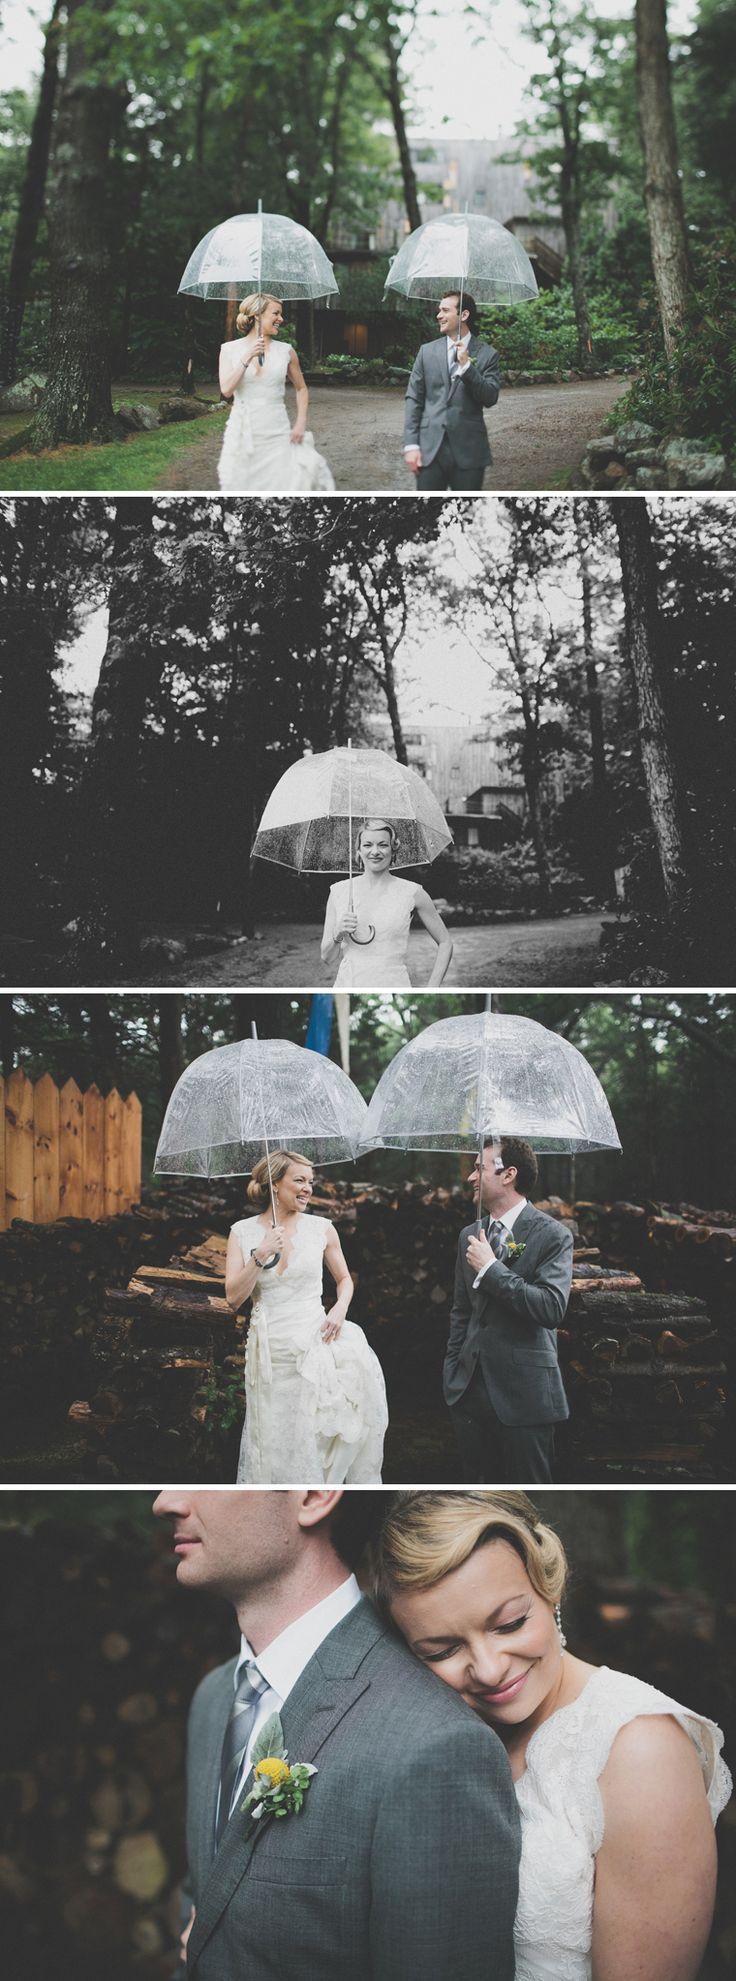 Let it rain on me! fotoshoot fotografie